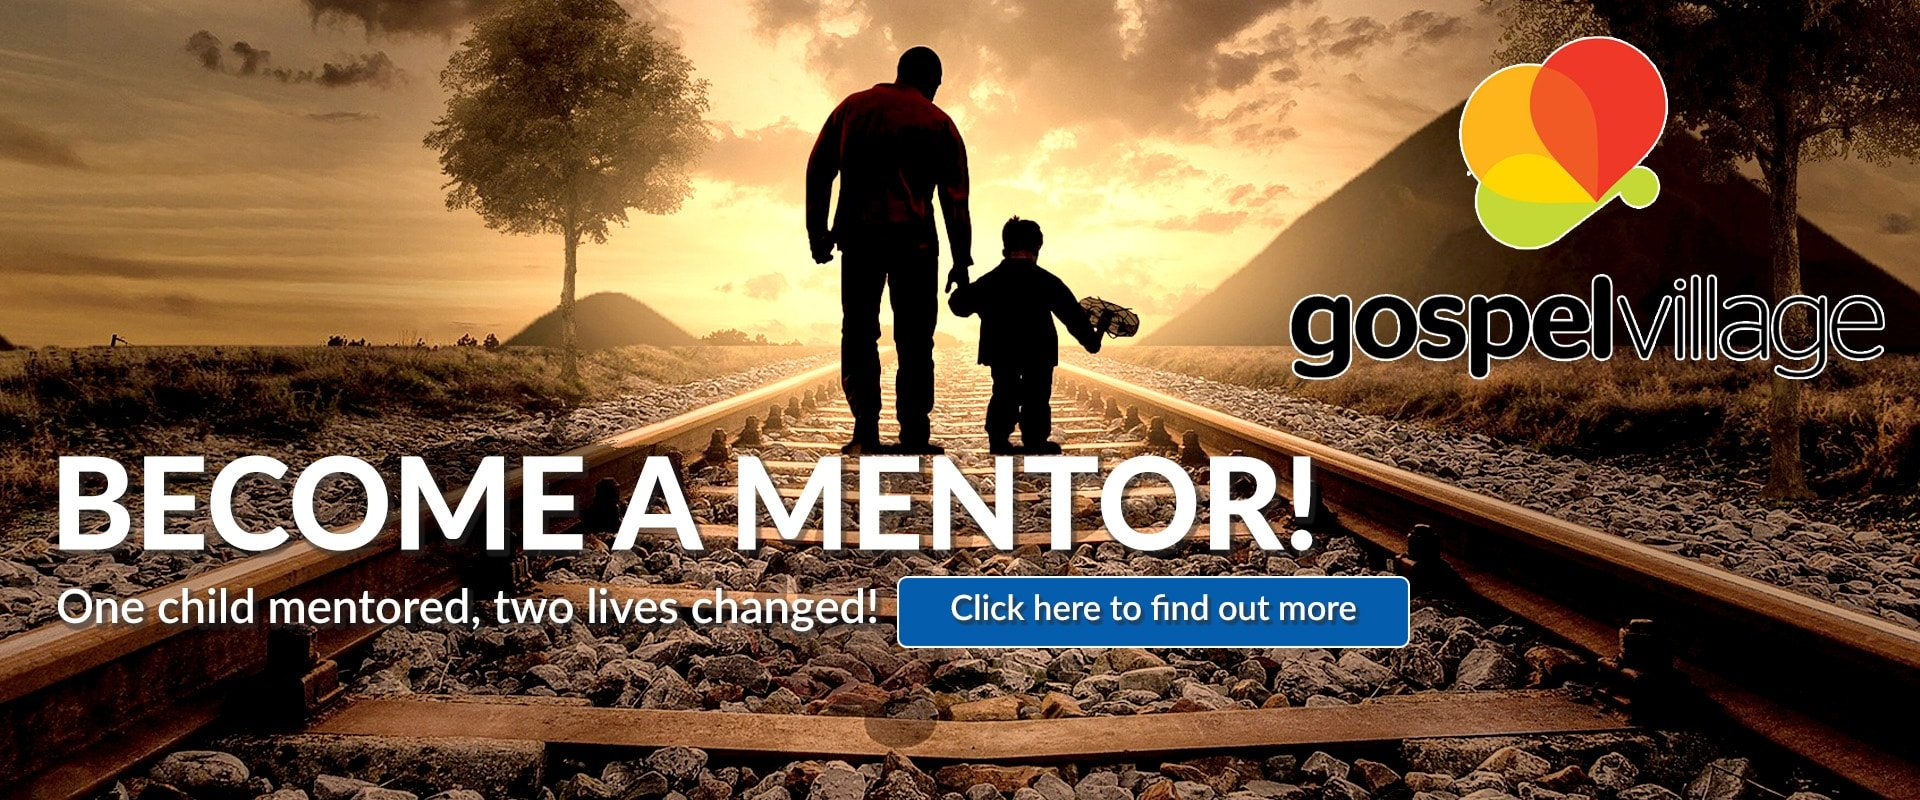 91.3 KGLY East Texas Christian Radio Gospel Village Be a Mentor